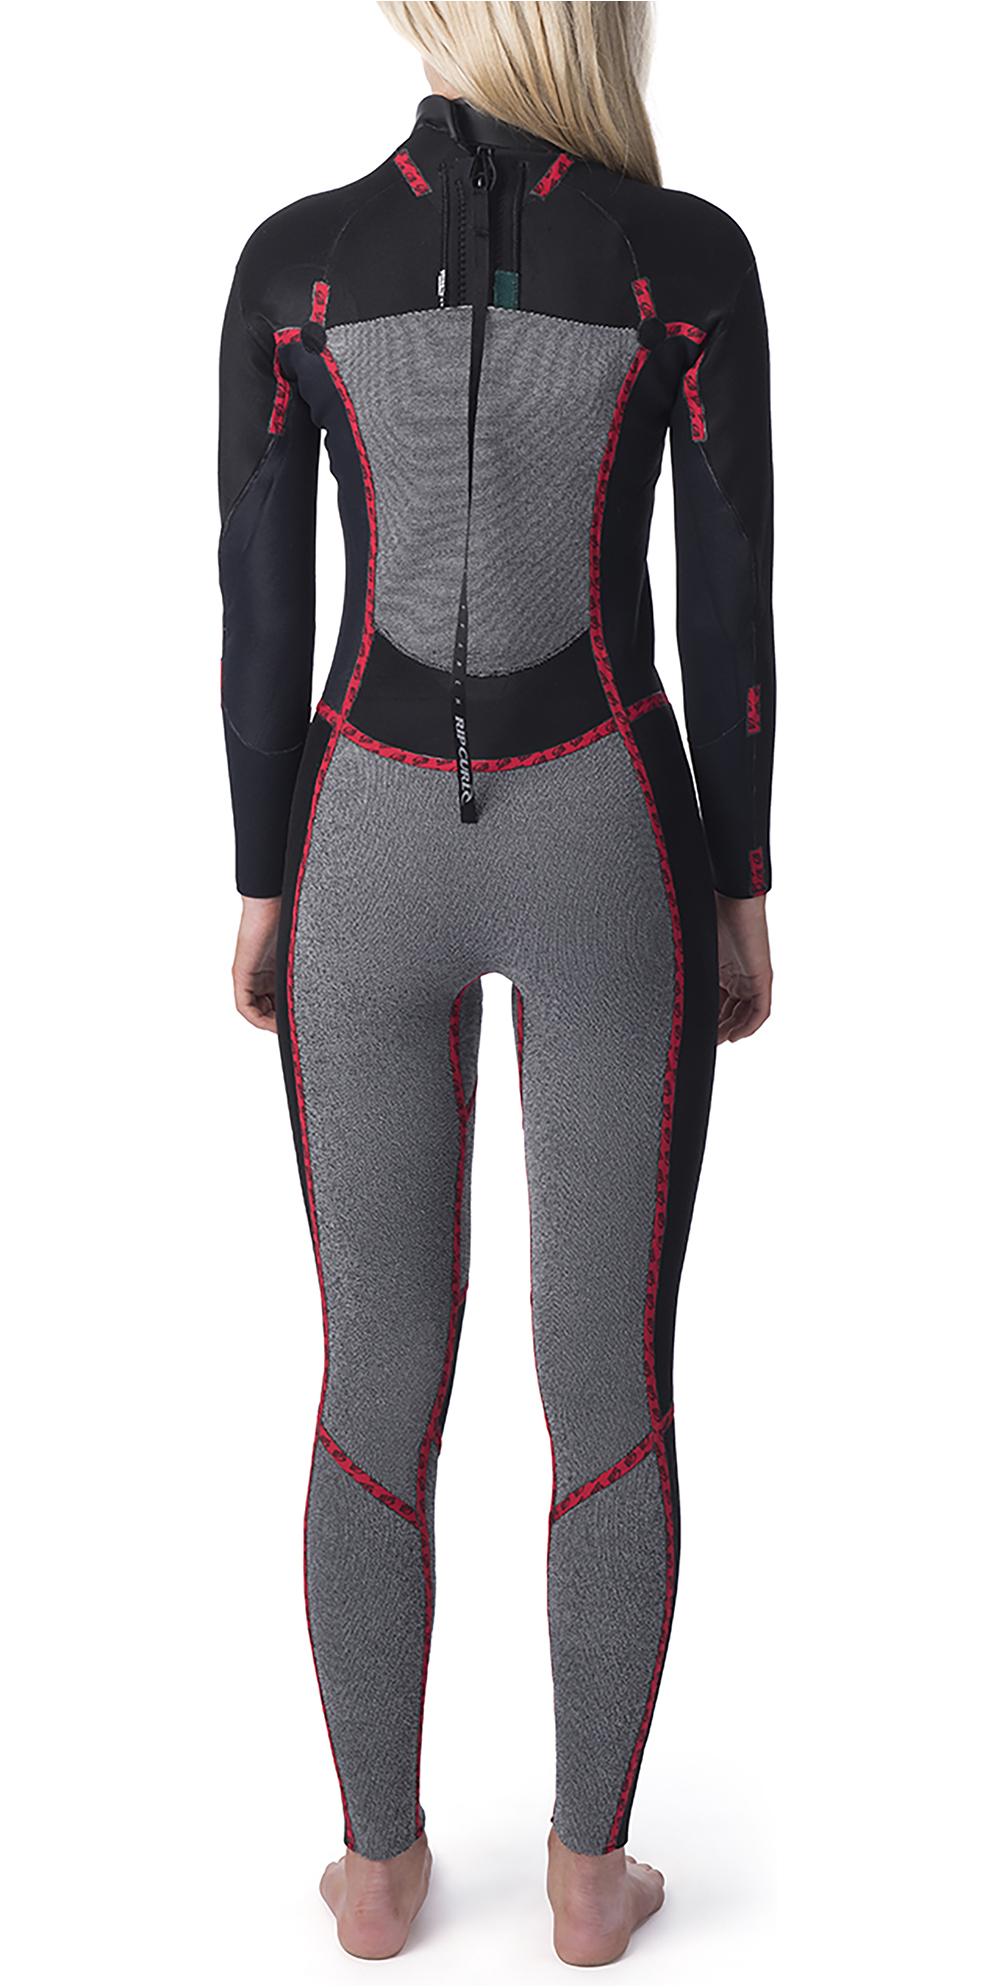 2019 Rip Curl Womens Dawn Patrol 5/3mm Back Zip Wetsuit Black / Black WSM9ES